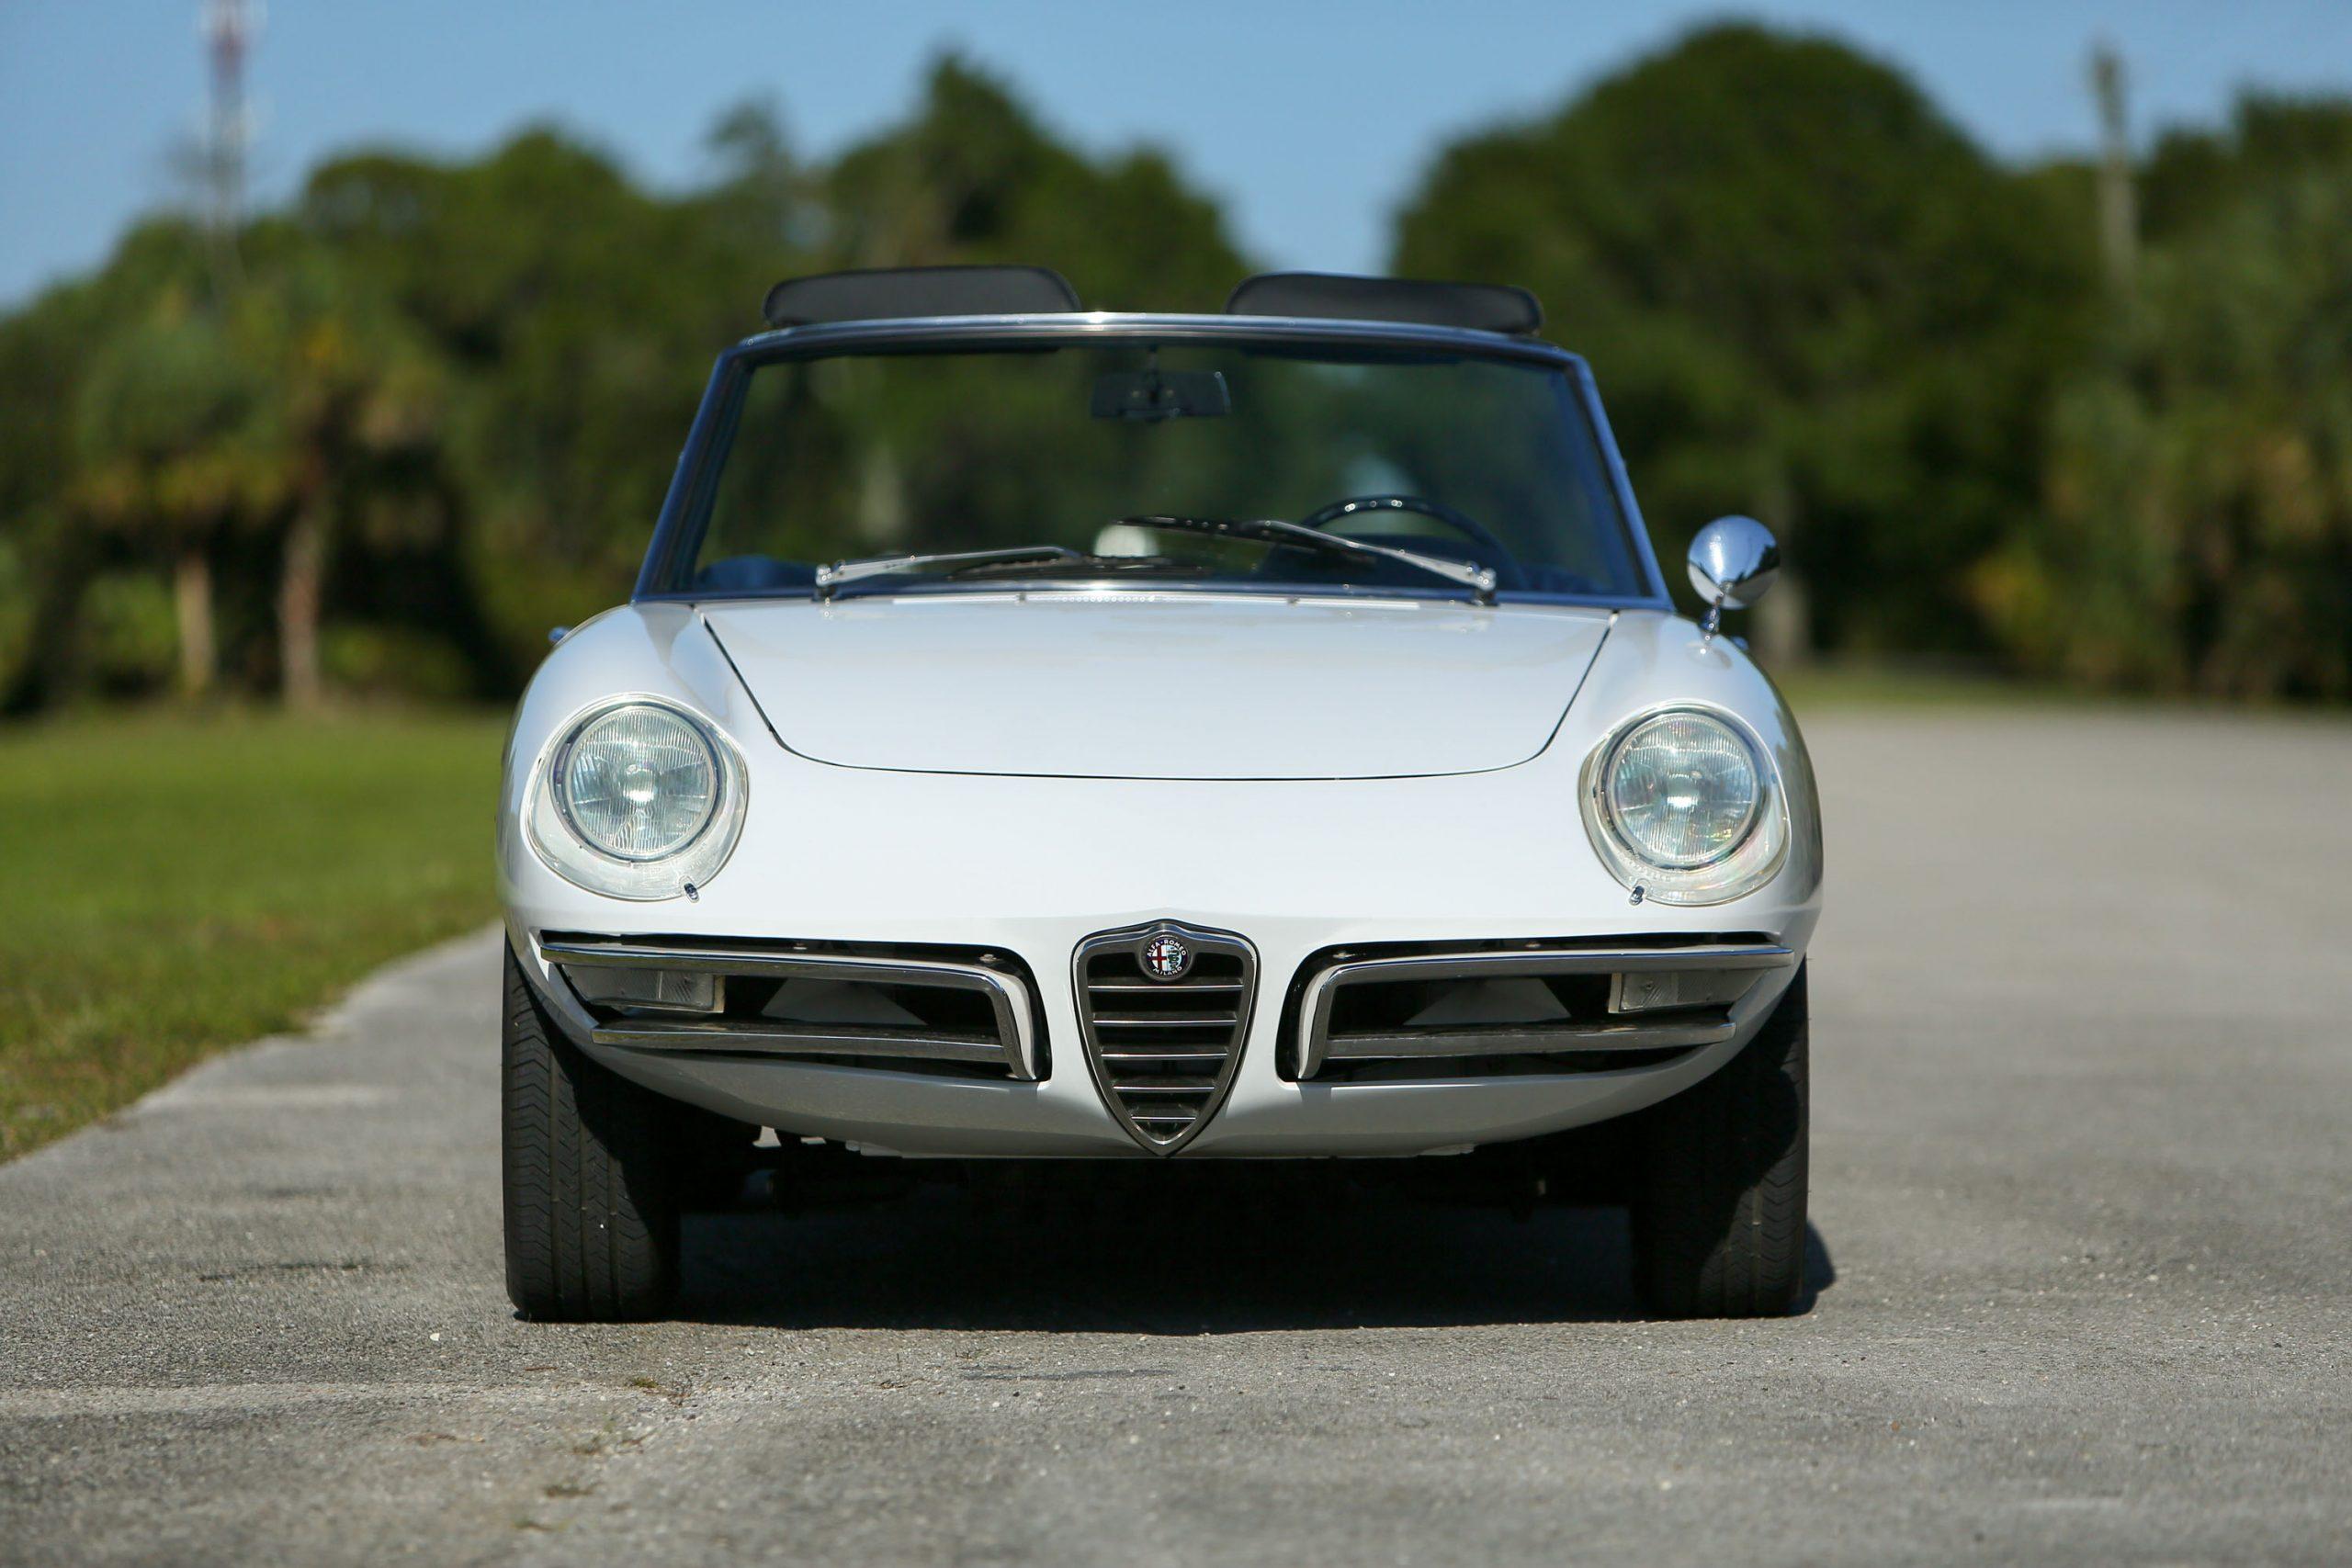 967 Alfa Romeo 1600 'Duetto' Spider front